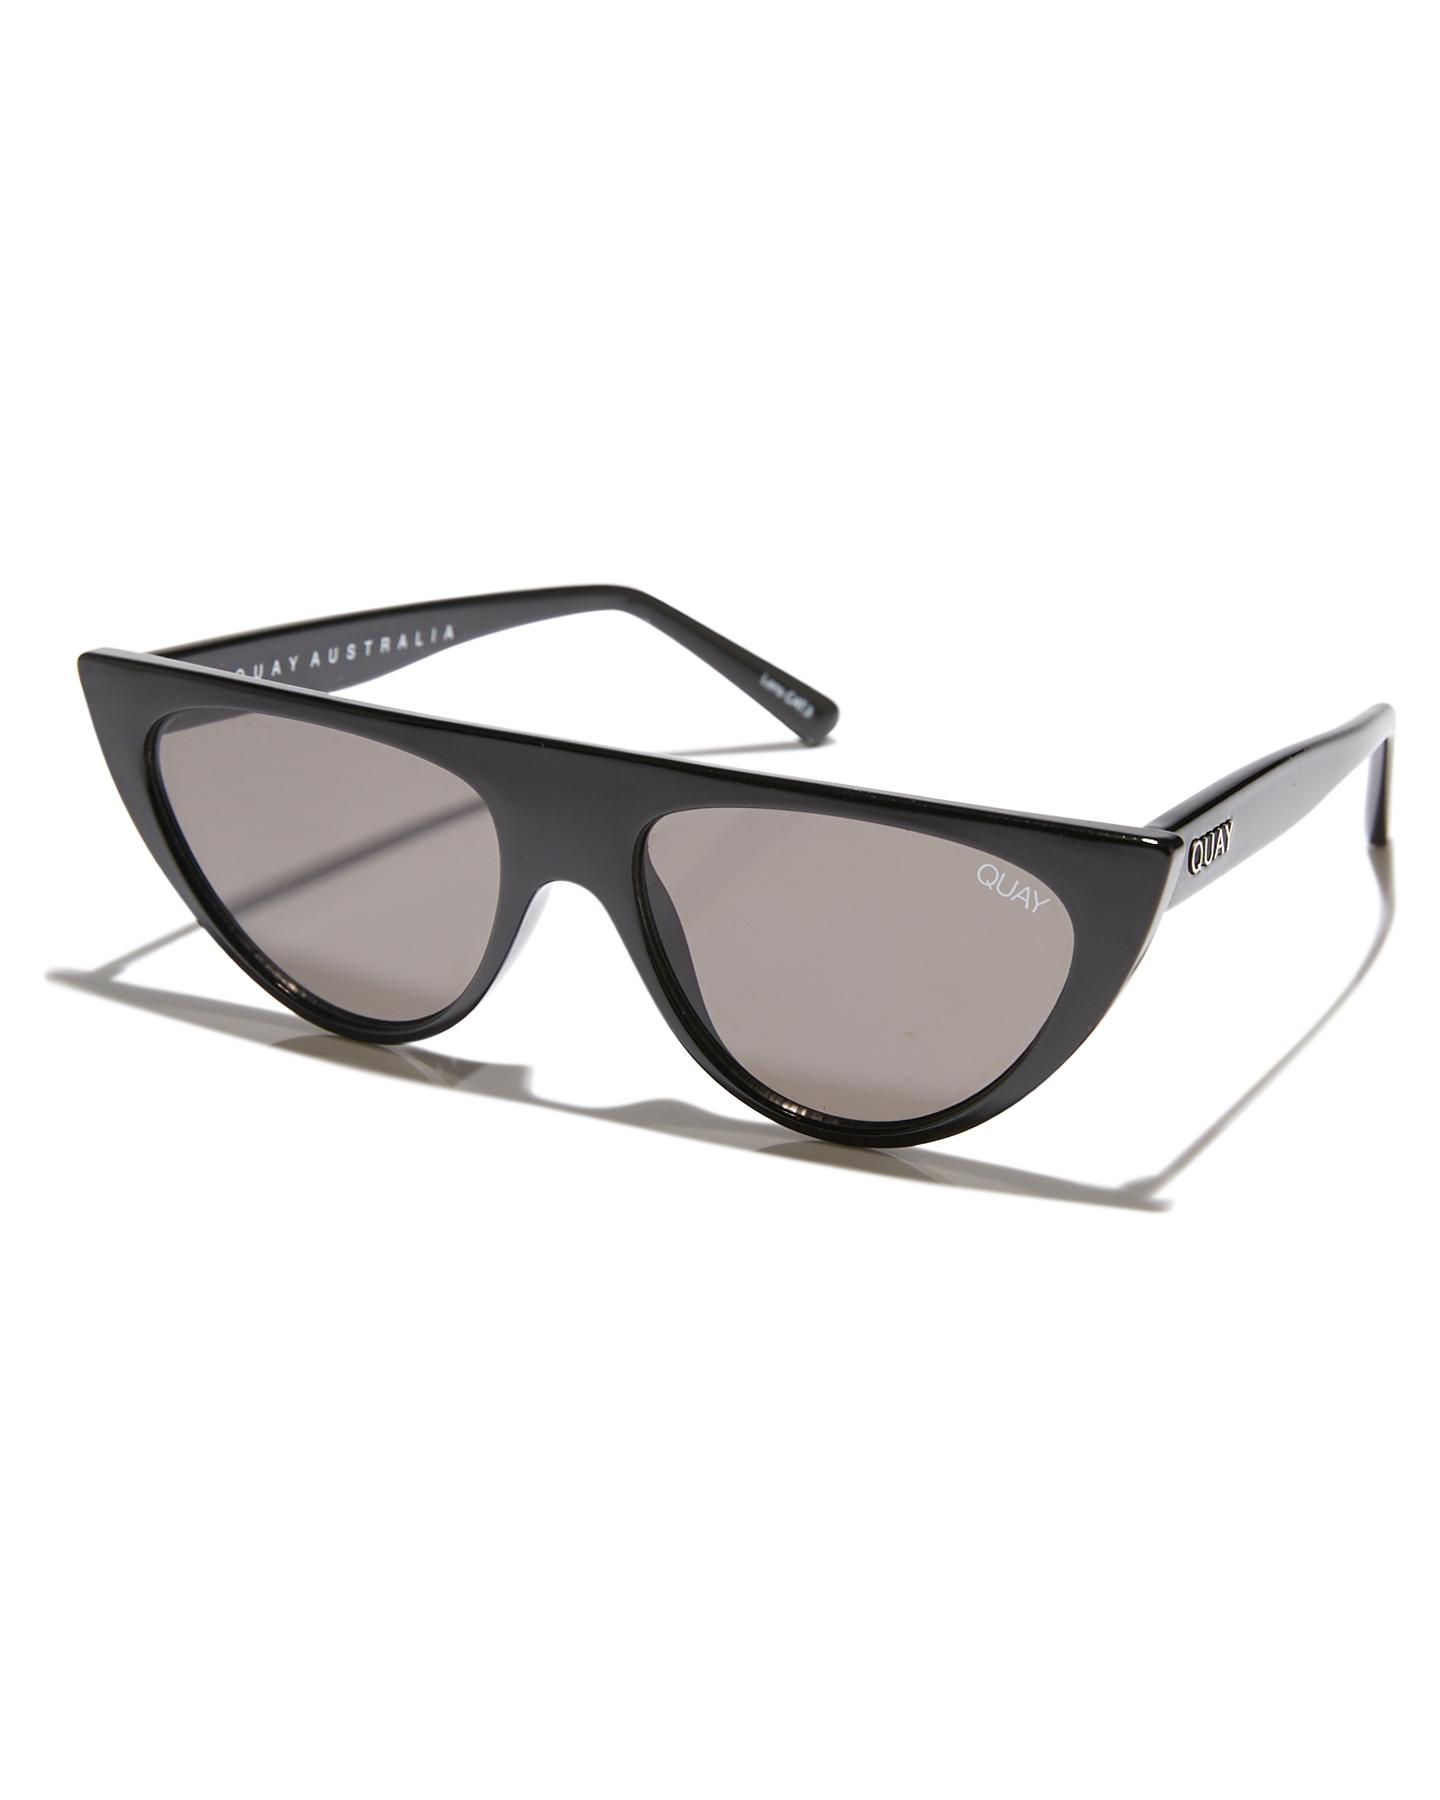 aa3a0120262 Quay Eyewear Sofia Richie Run Away Sunglasses - Black Smoke